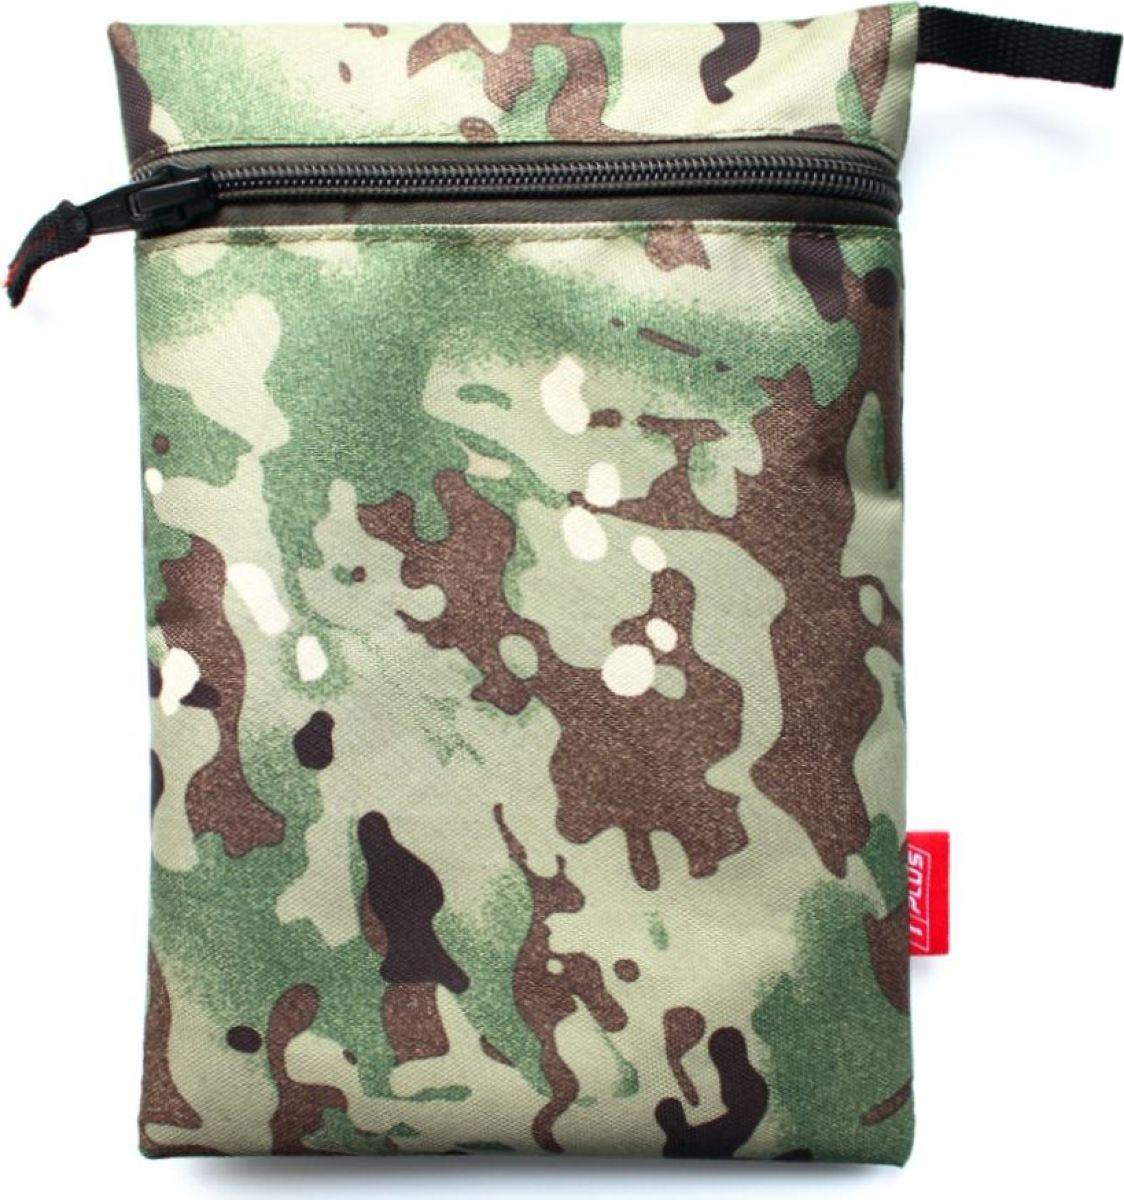 Мешок вещевой Tplus 600, цвет: мультиколор, 18 x 26 см сумка рыбака tplus 600 цвет цифра 40 x 22 x 24 см